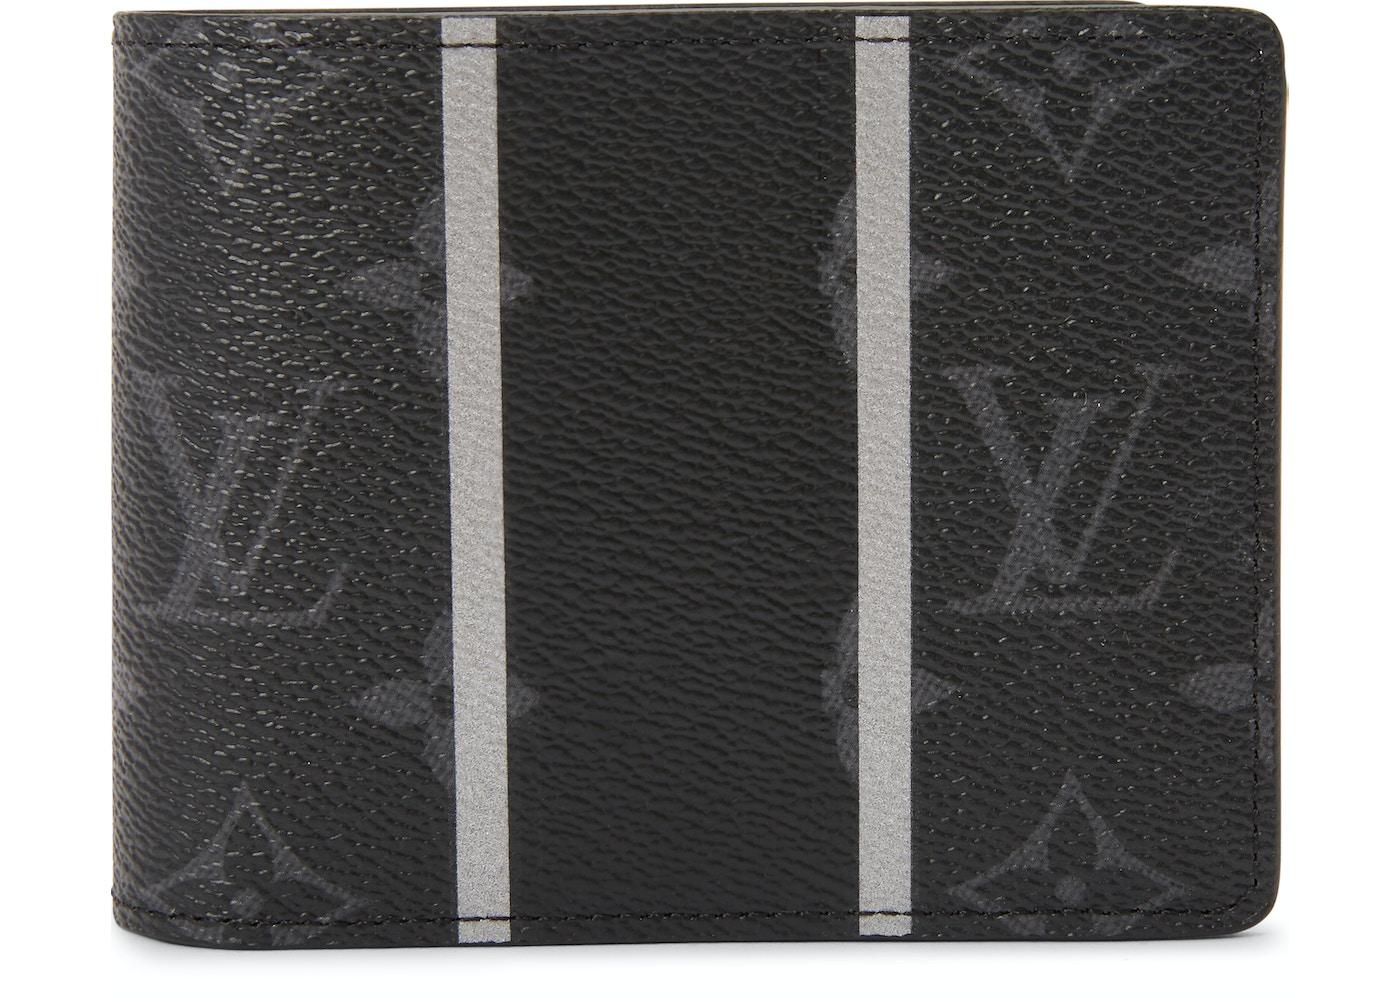 e00ffc9a14b3 Louis Vuitton x fragment Multiple Wallet Monogram Eclipse Black